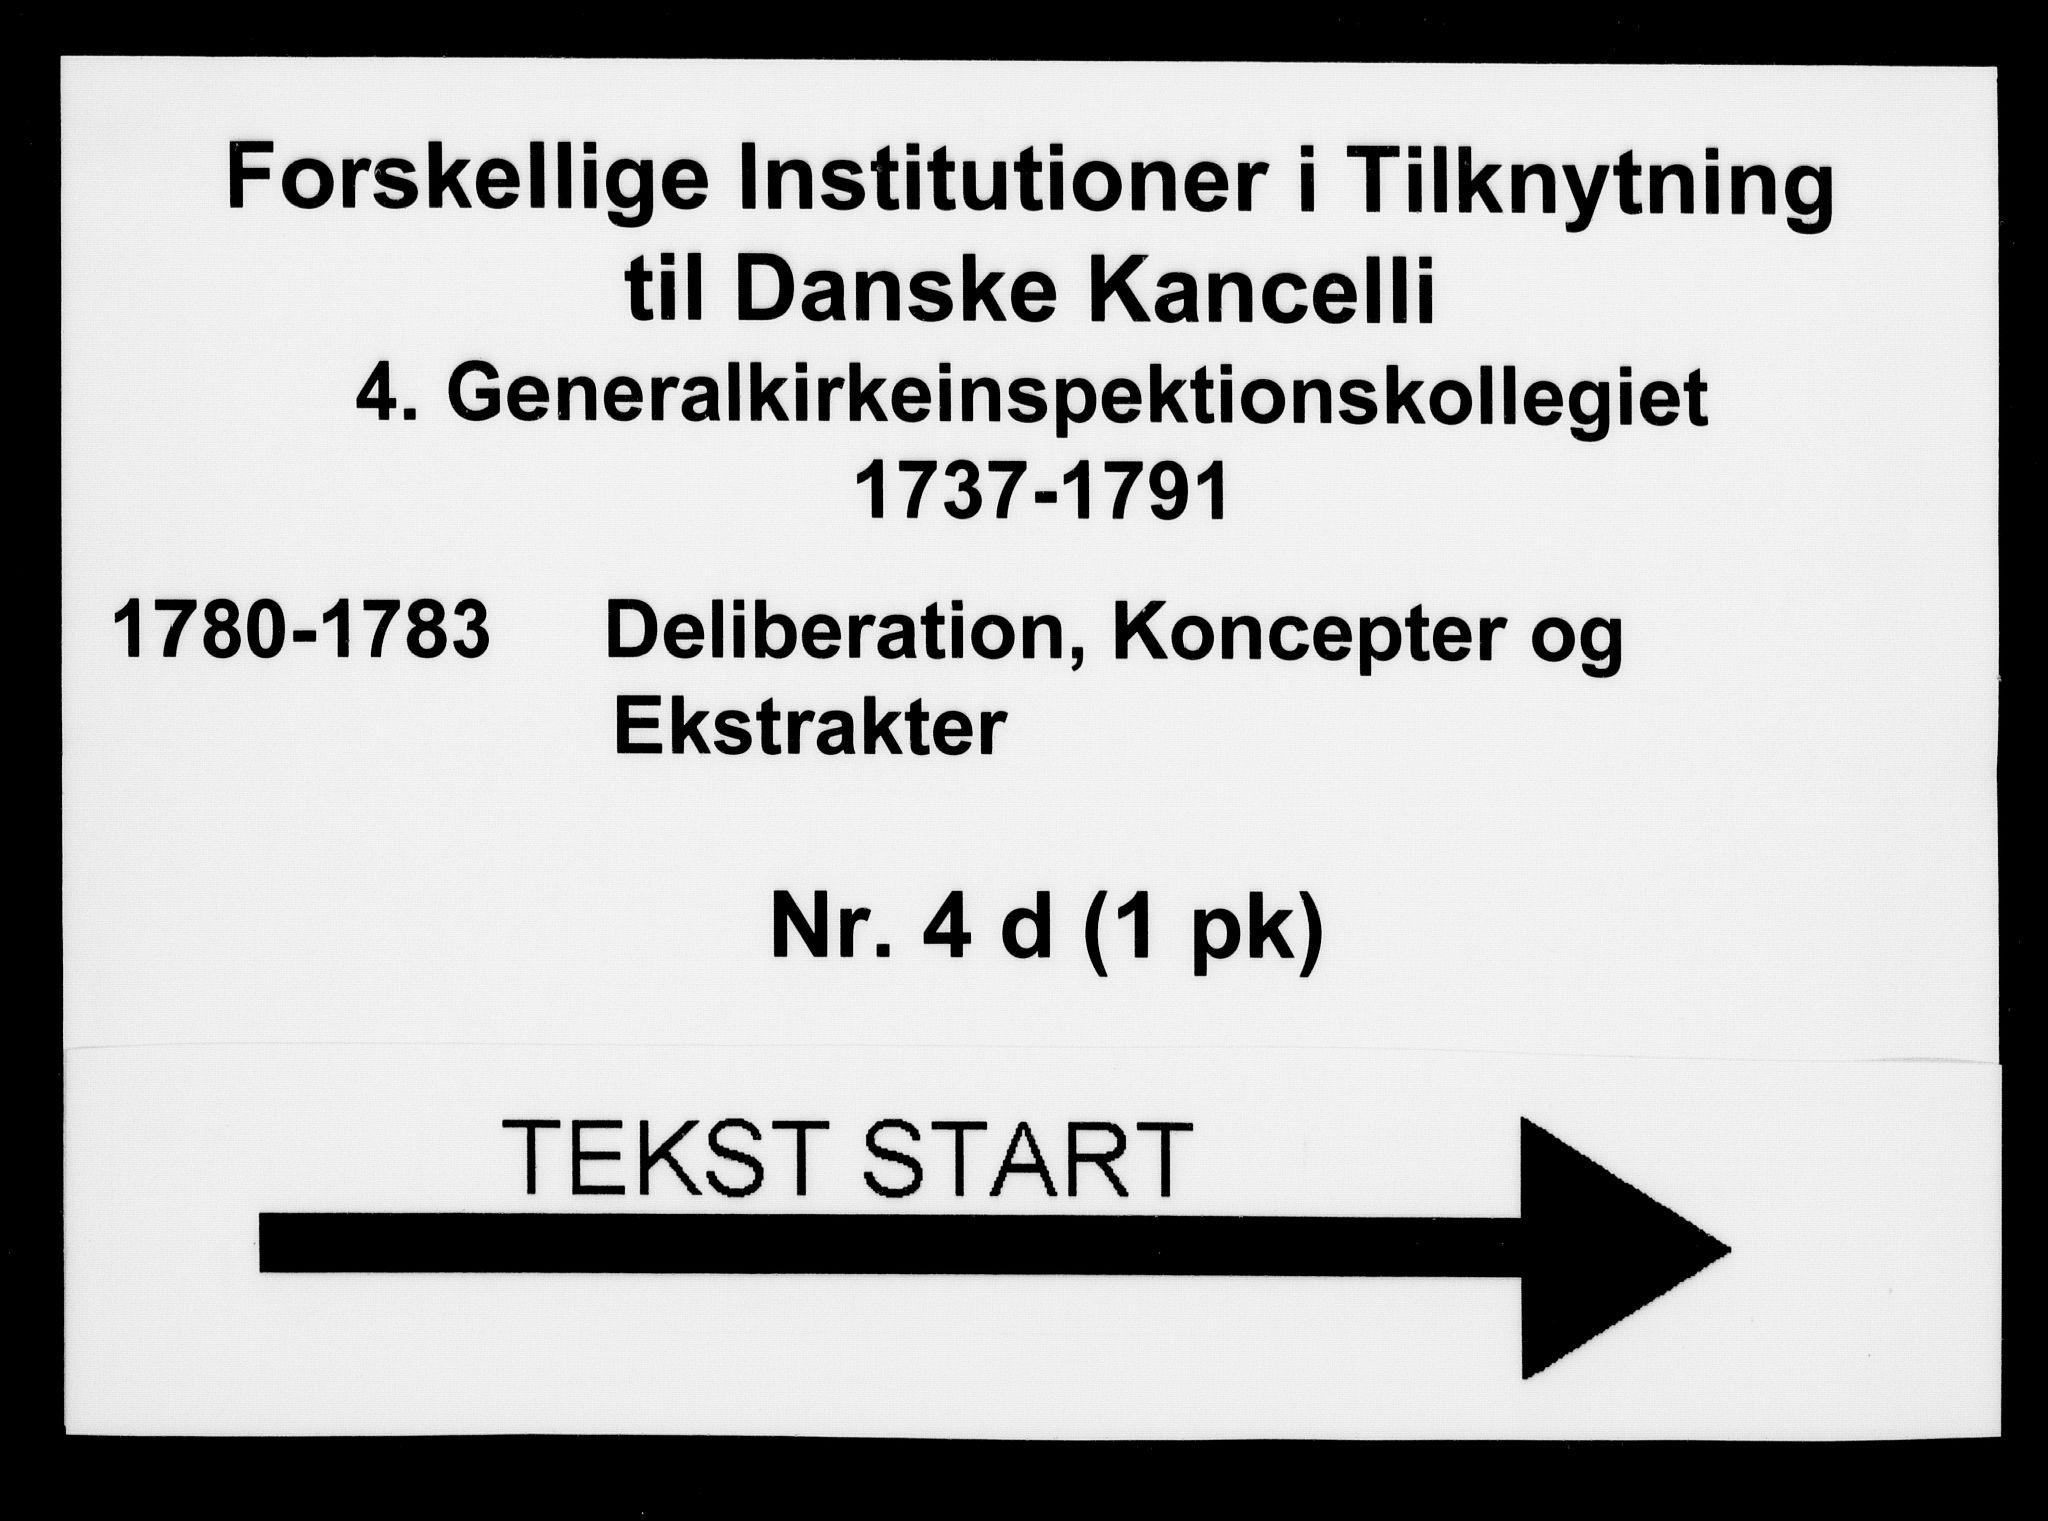 DRA, Generalkirkeinspektionskollegiet, F4-04/F4-04-04: Deliberation, koncepter og ekstrakter, 1780-1783